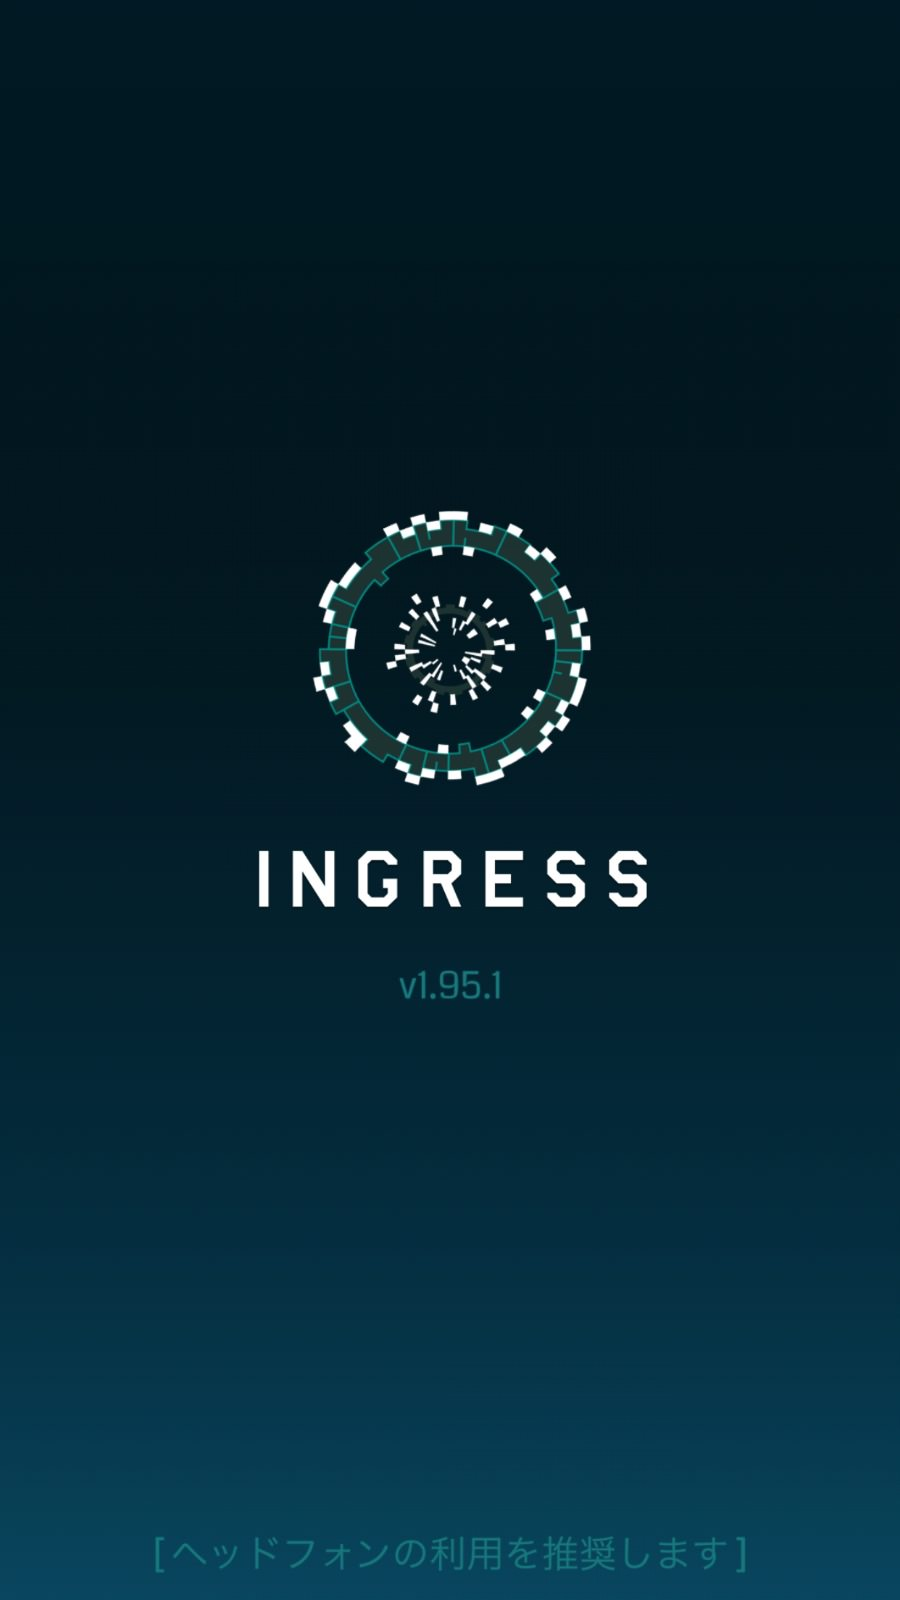 Ingress update 2217